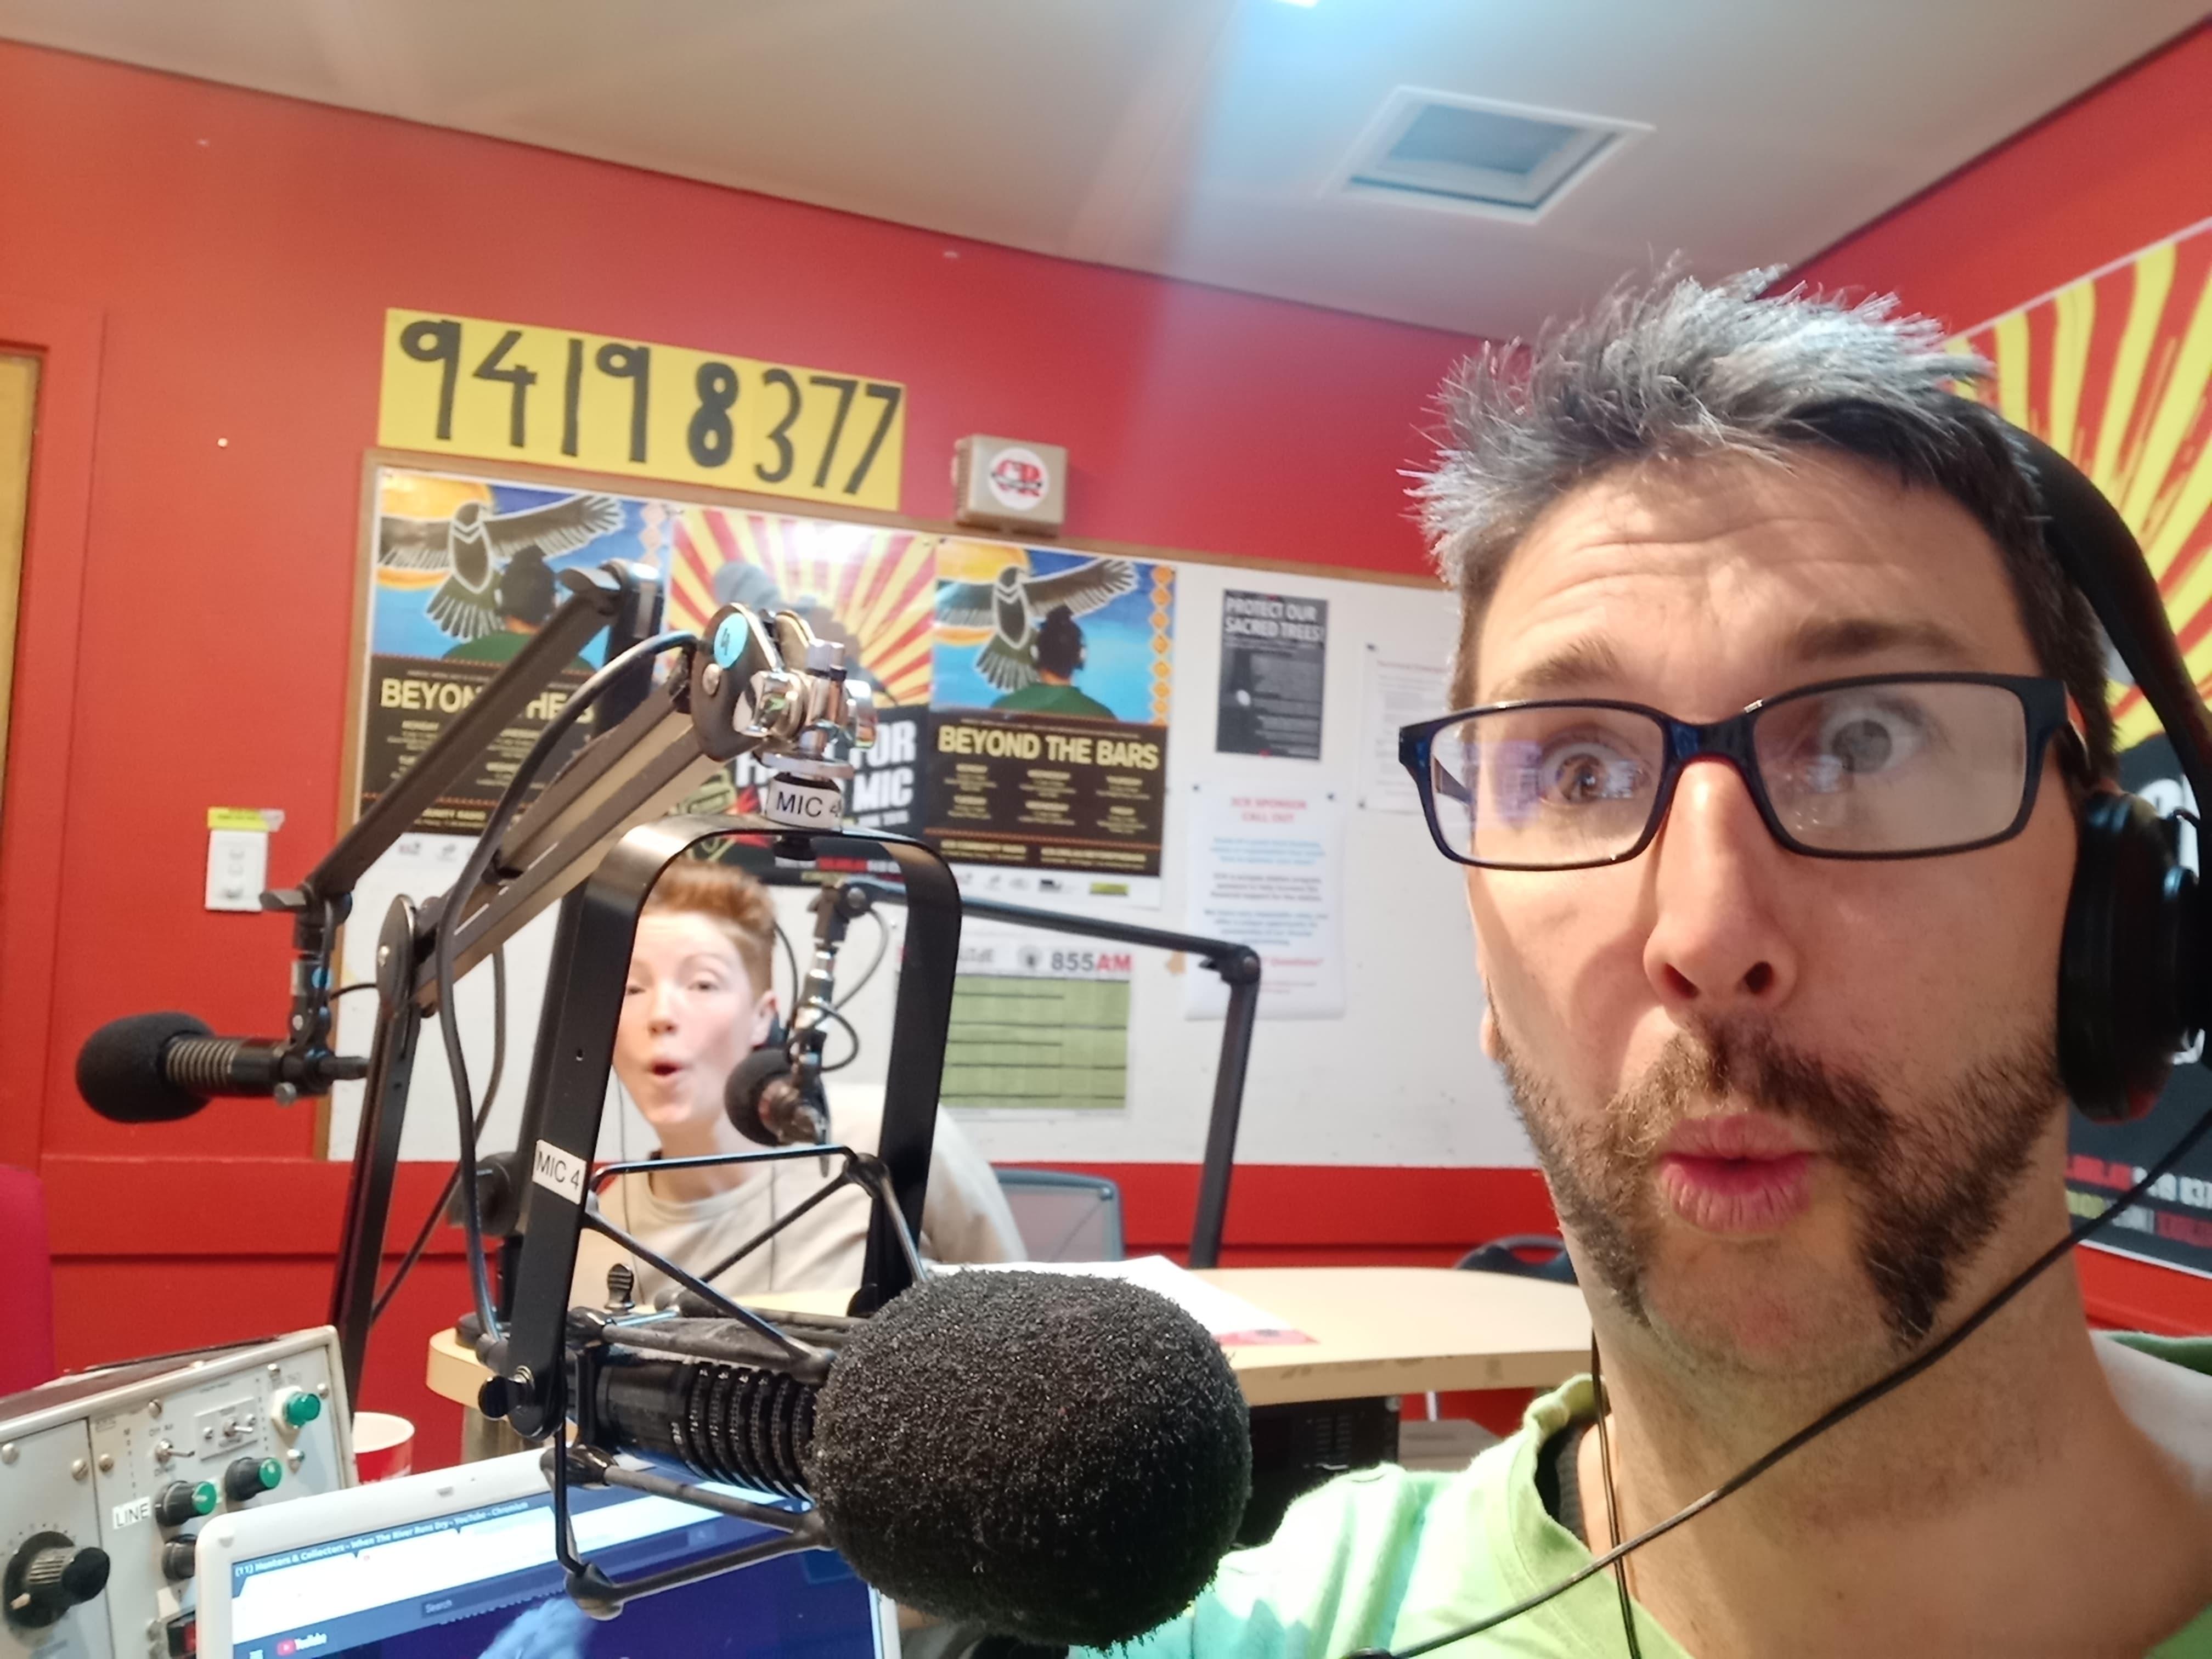 Megan Williams joins Dirt Radio's Phil Evans in the studio at 3CR